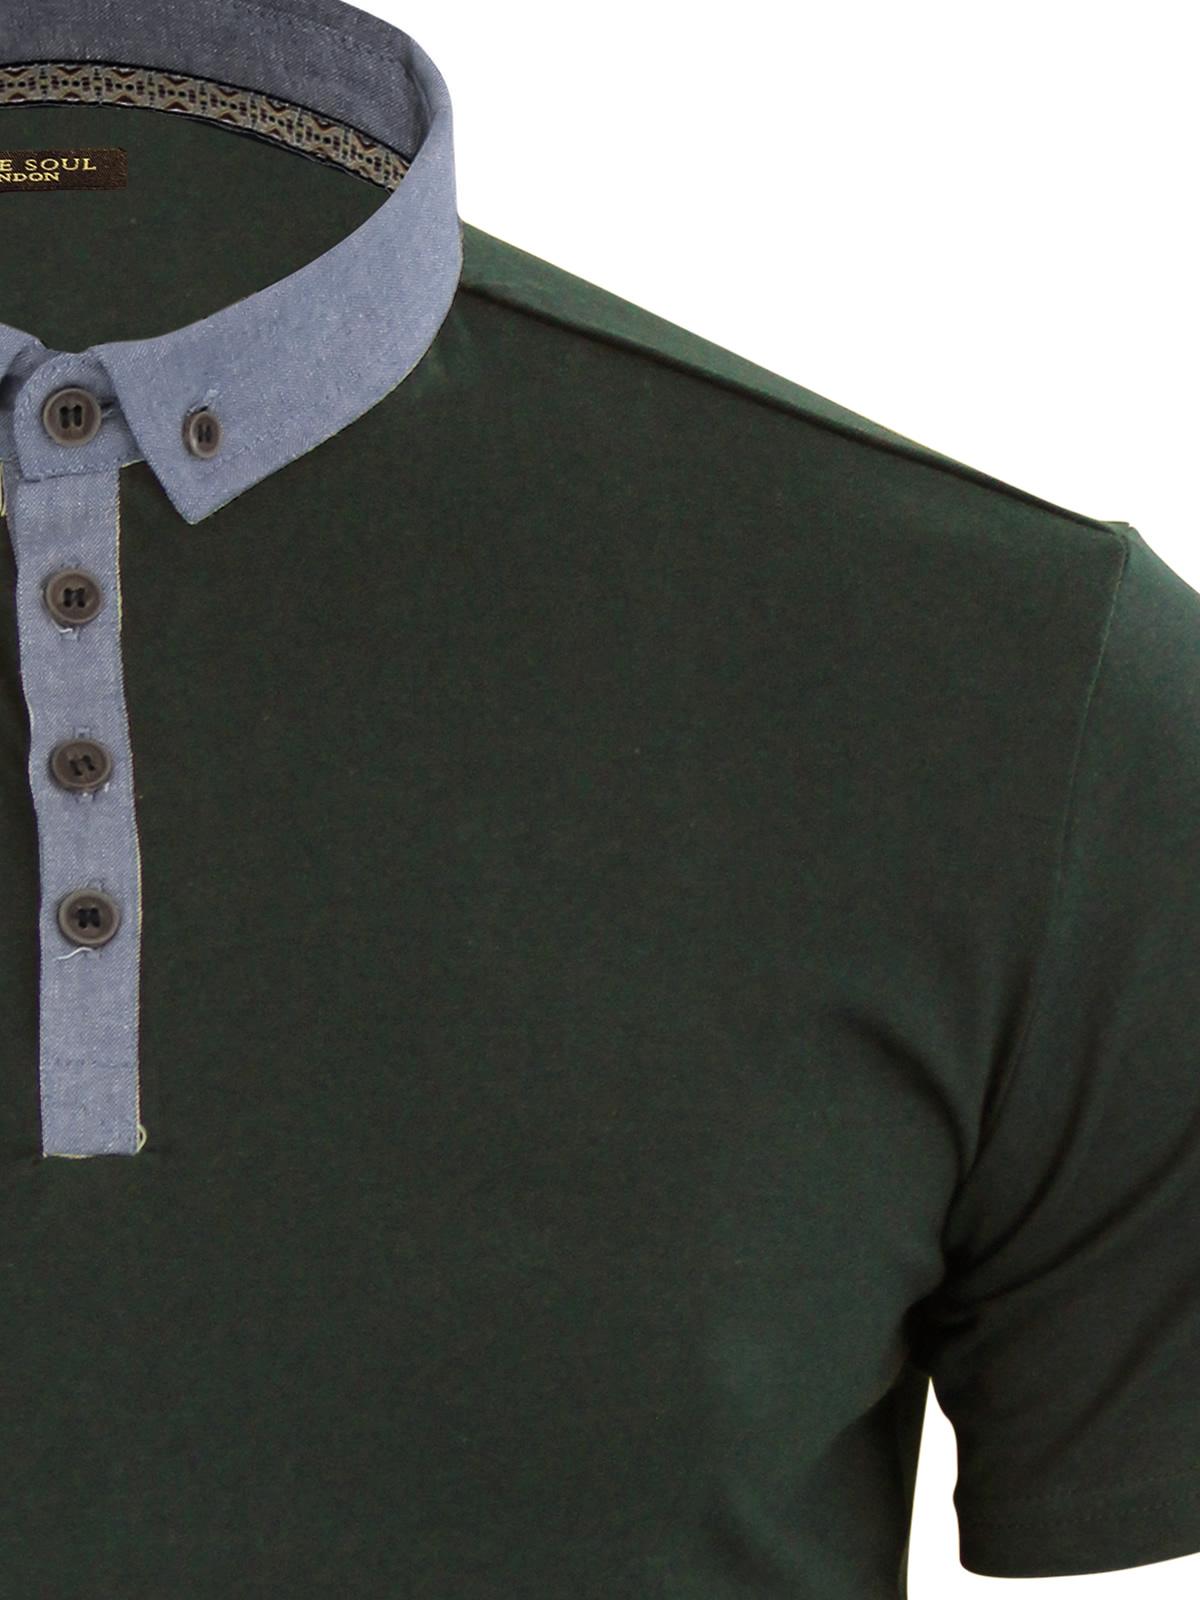 Mens-Polo-T-Shirt-Brave-Soul-Chimera-Chambray-Collared-Cotton-Casual-Top thumbnail 16